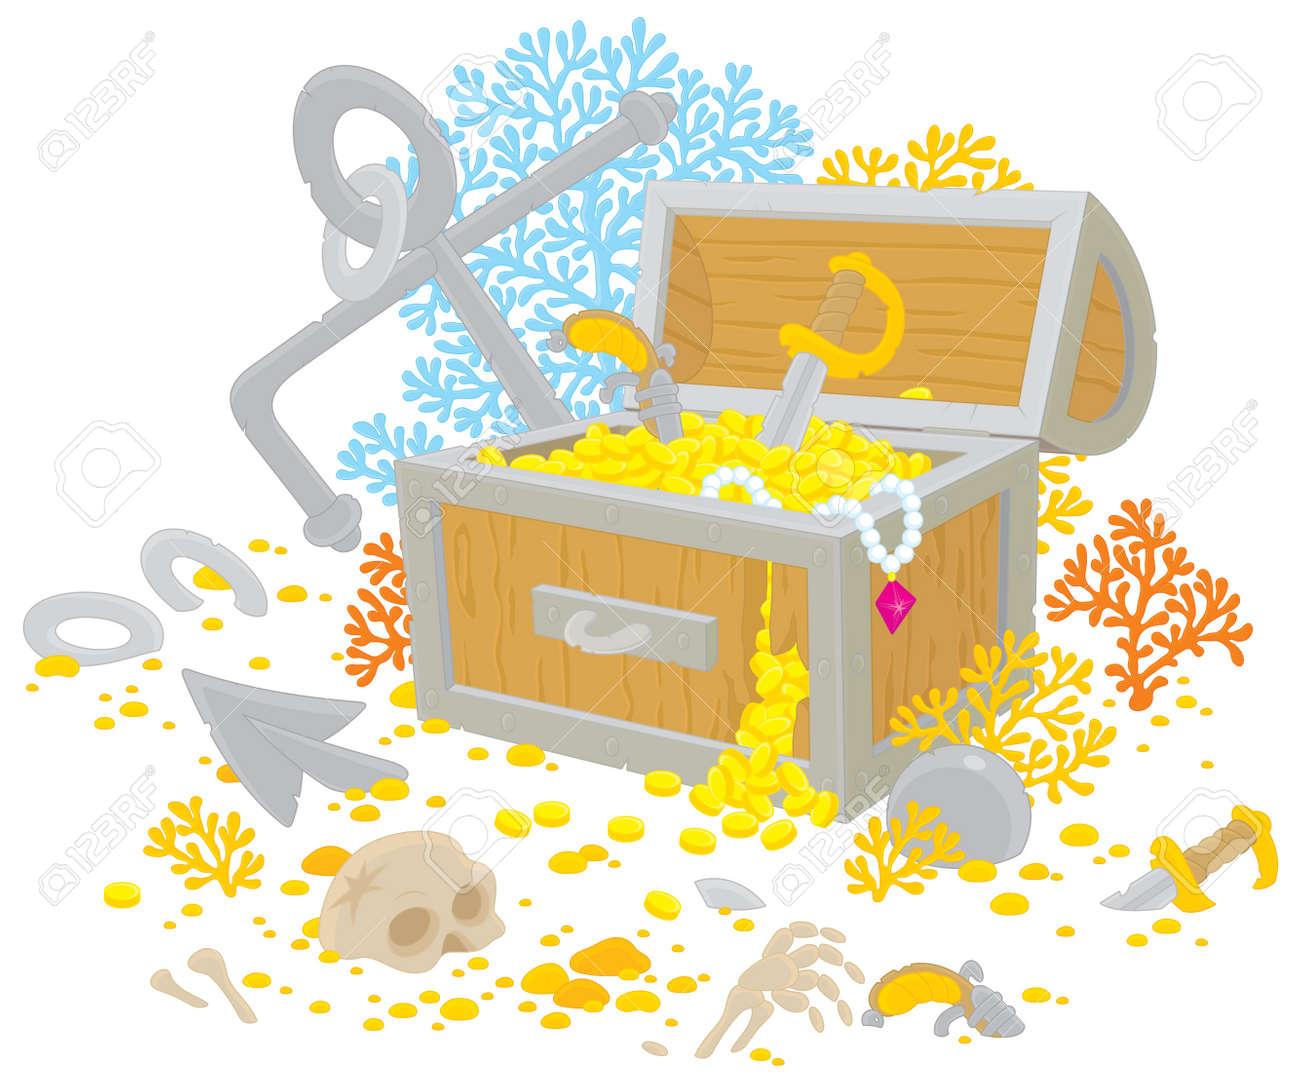 Treasure chest of a sunken pirate ship Stock Vector - 13129426